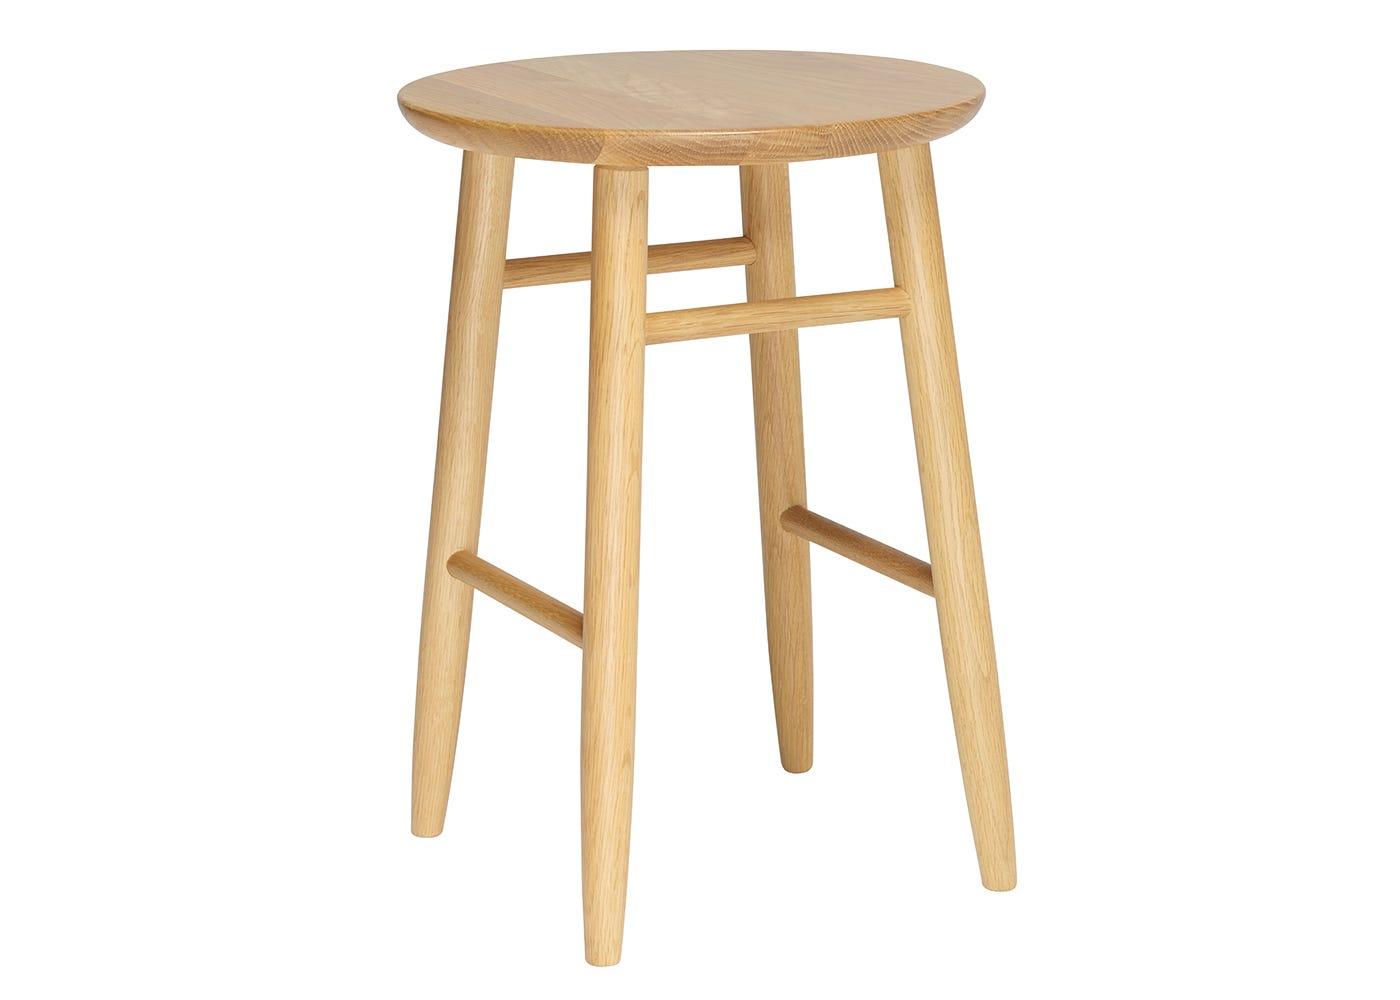 Teramo Dressing Table Stool - Side View